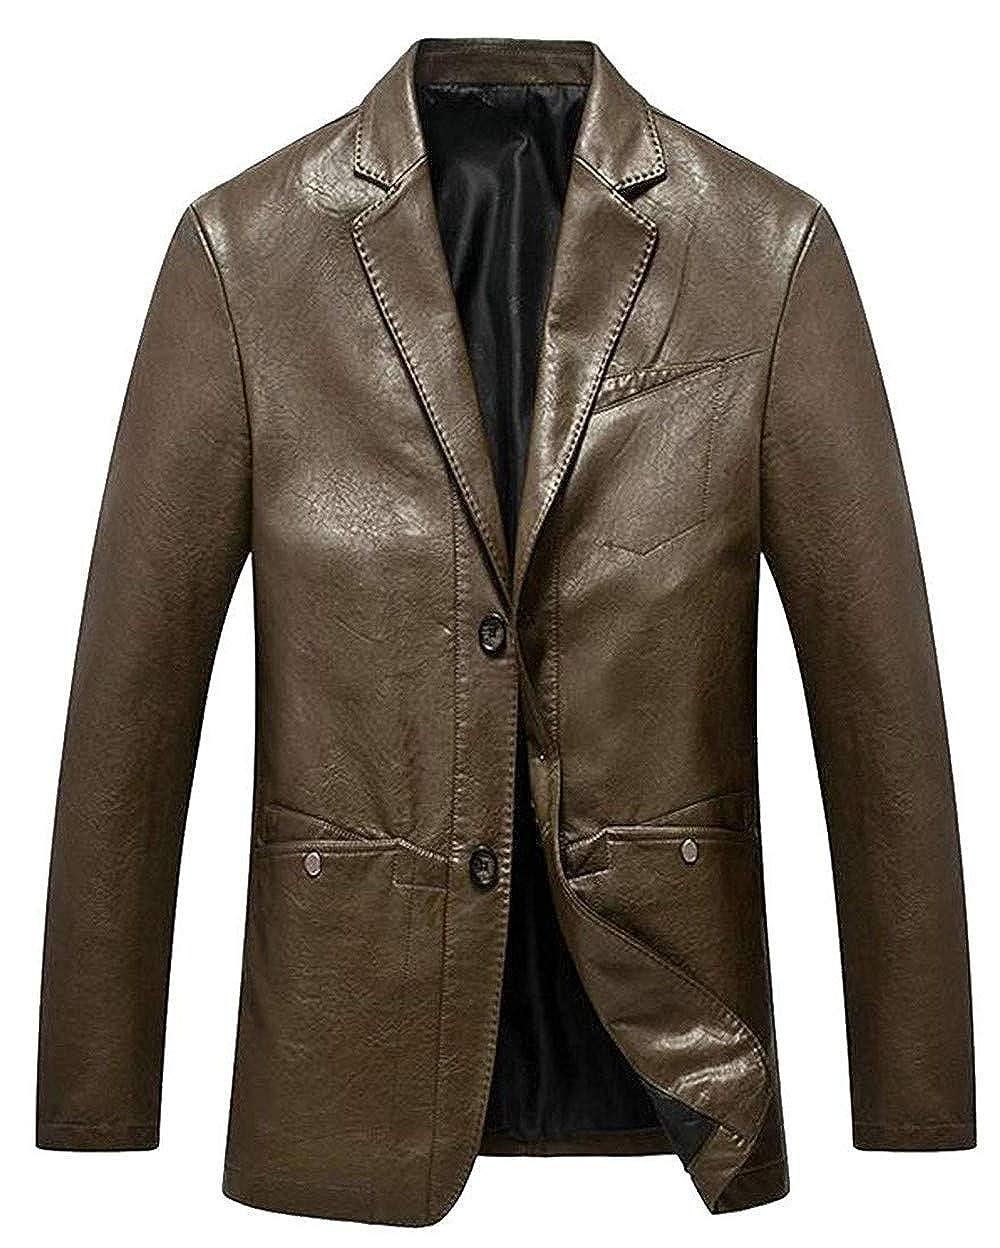 Mens Slim Single Breasted Casual PU Dress Blazer Jacket Suit Coat